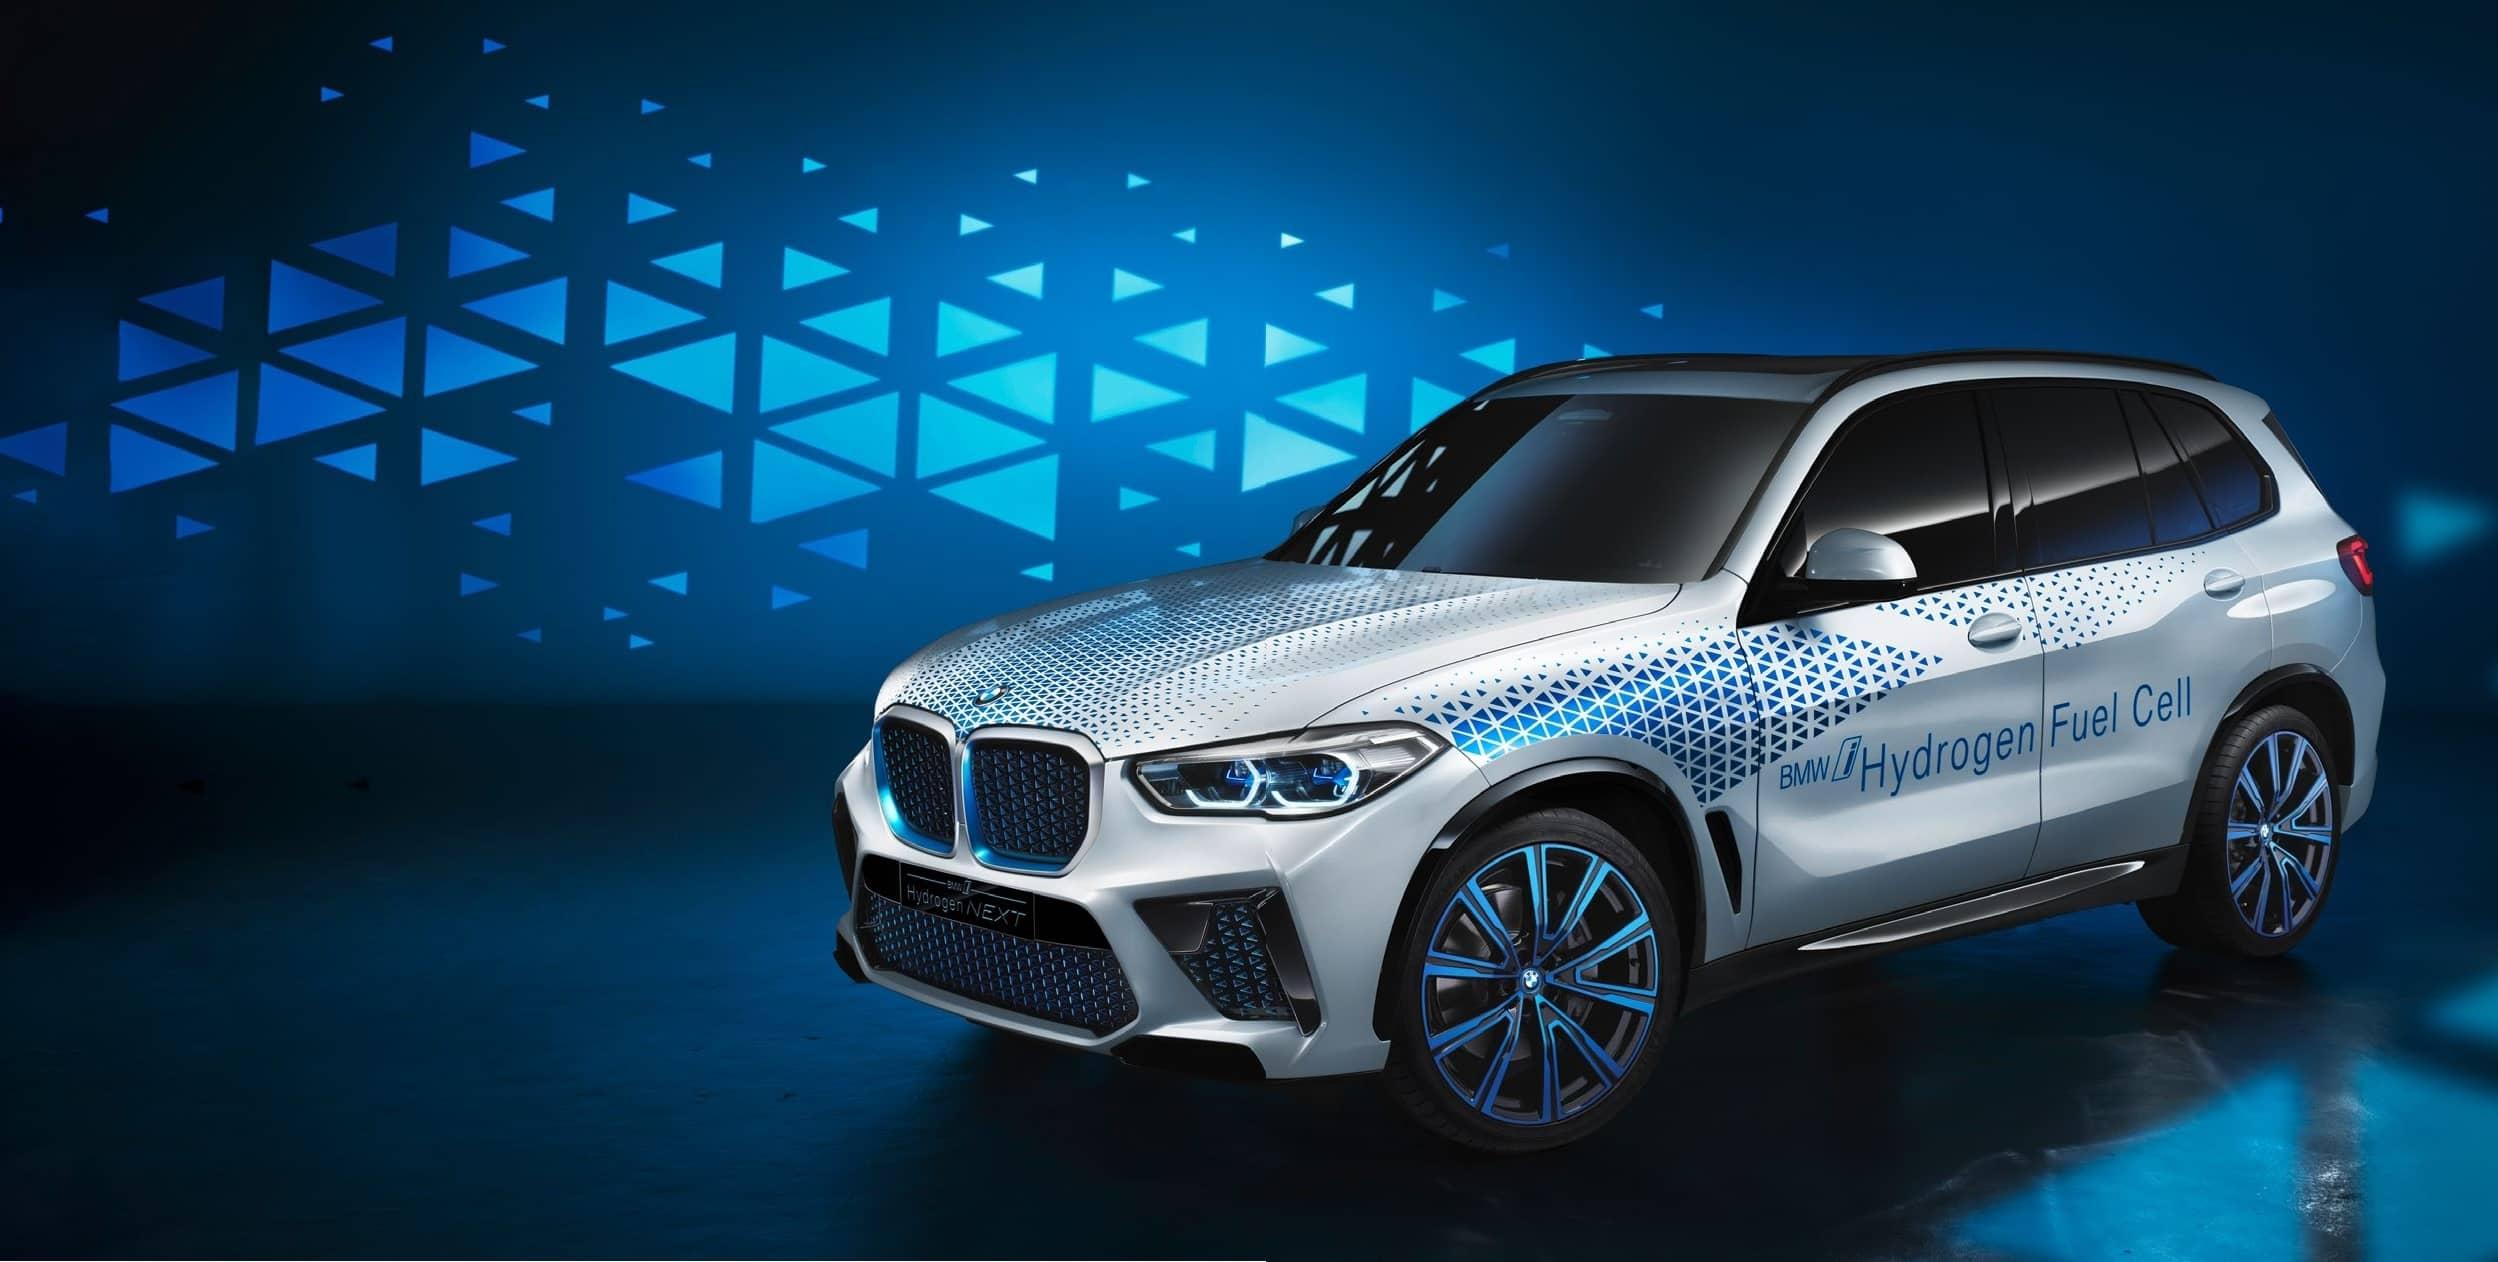 BMW i Hydrogen Fuel Cell Making Steady Progress